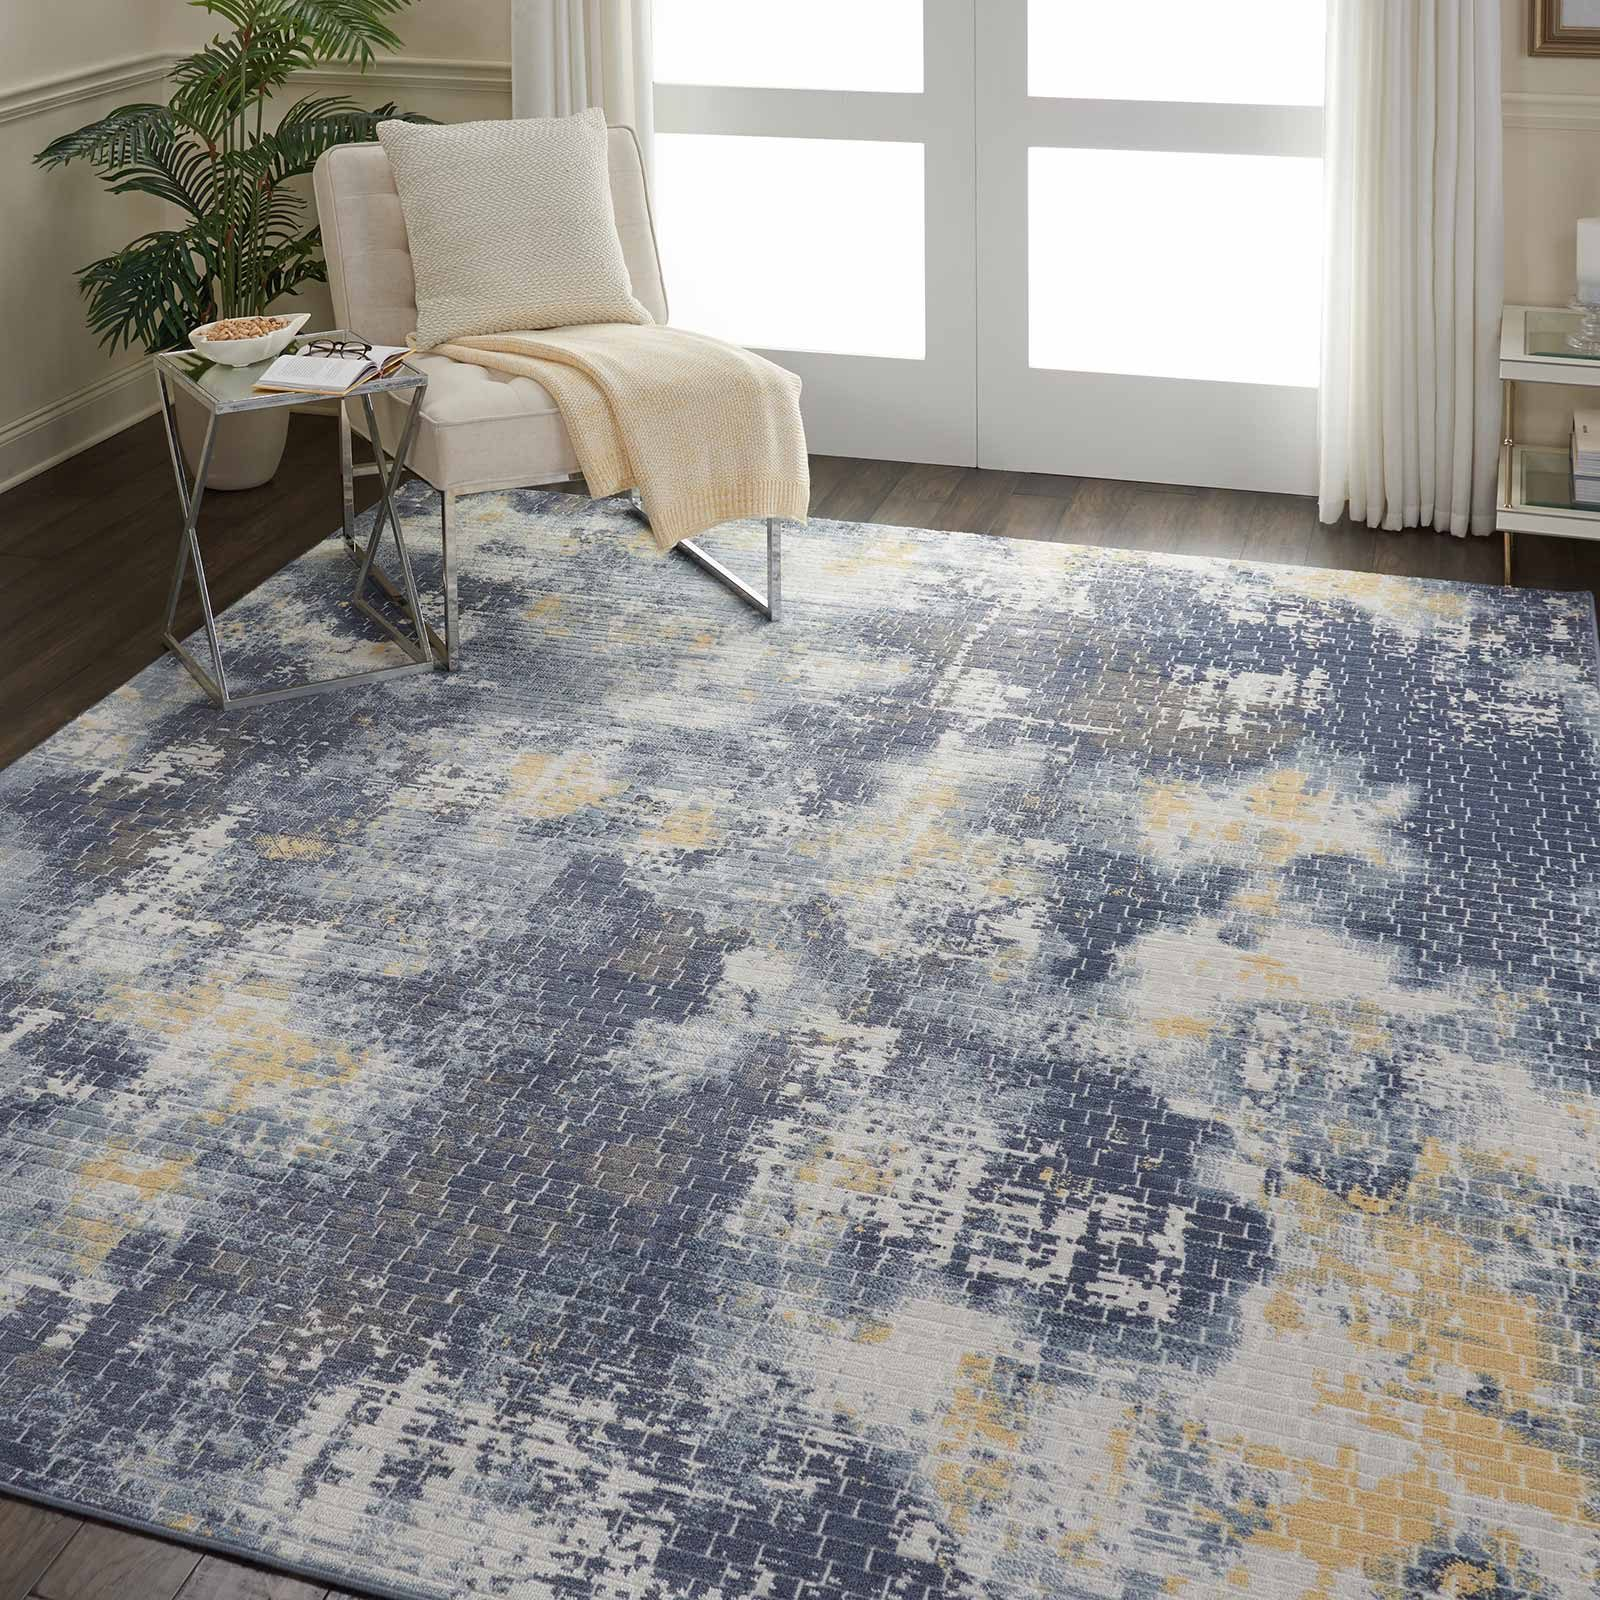 Nourison rug Urban Decor URD05 IVSKY 8X10 099446467133 interior 3 C